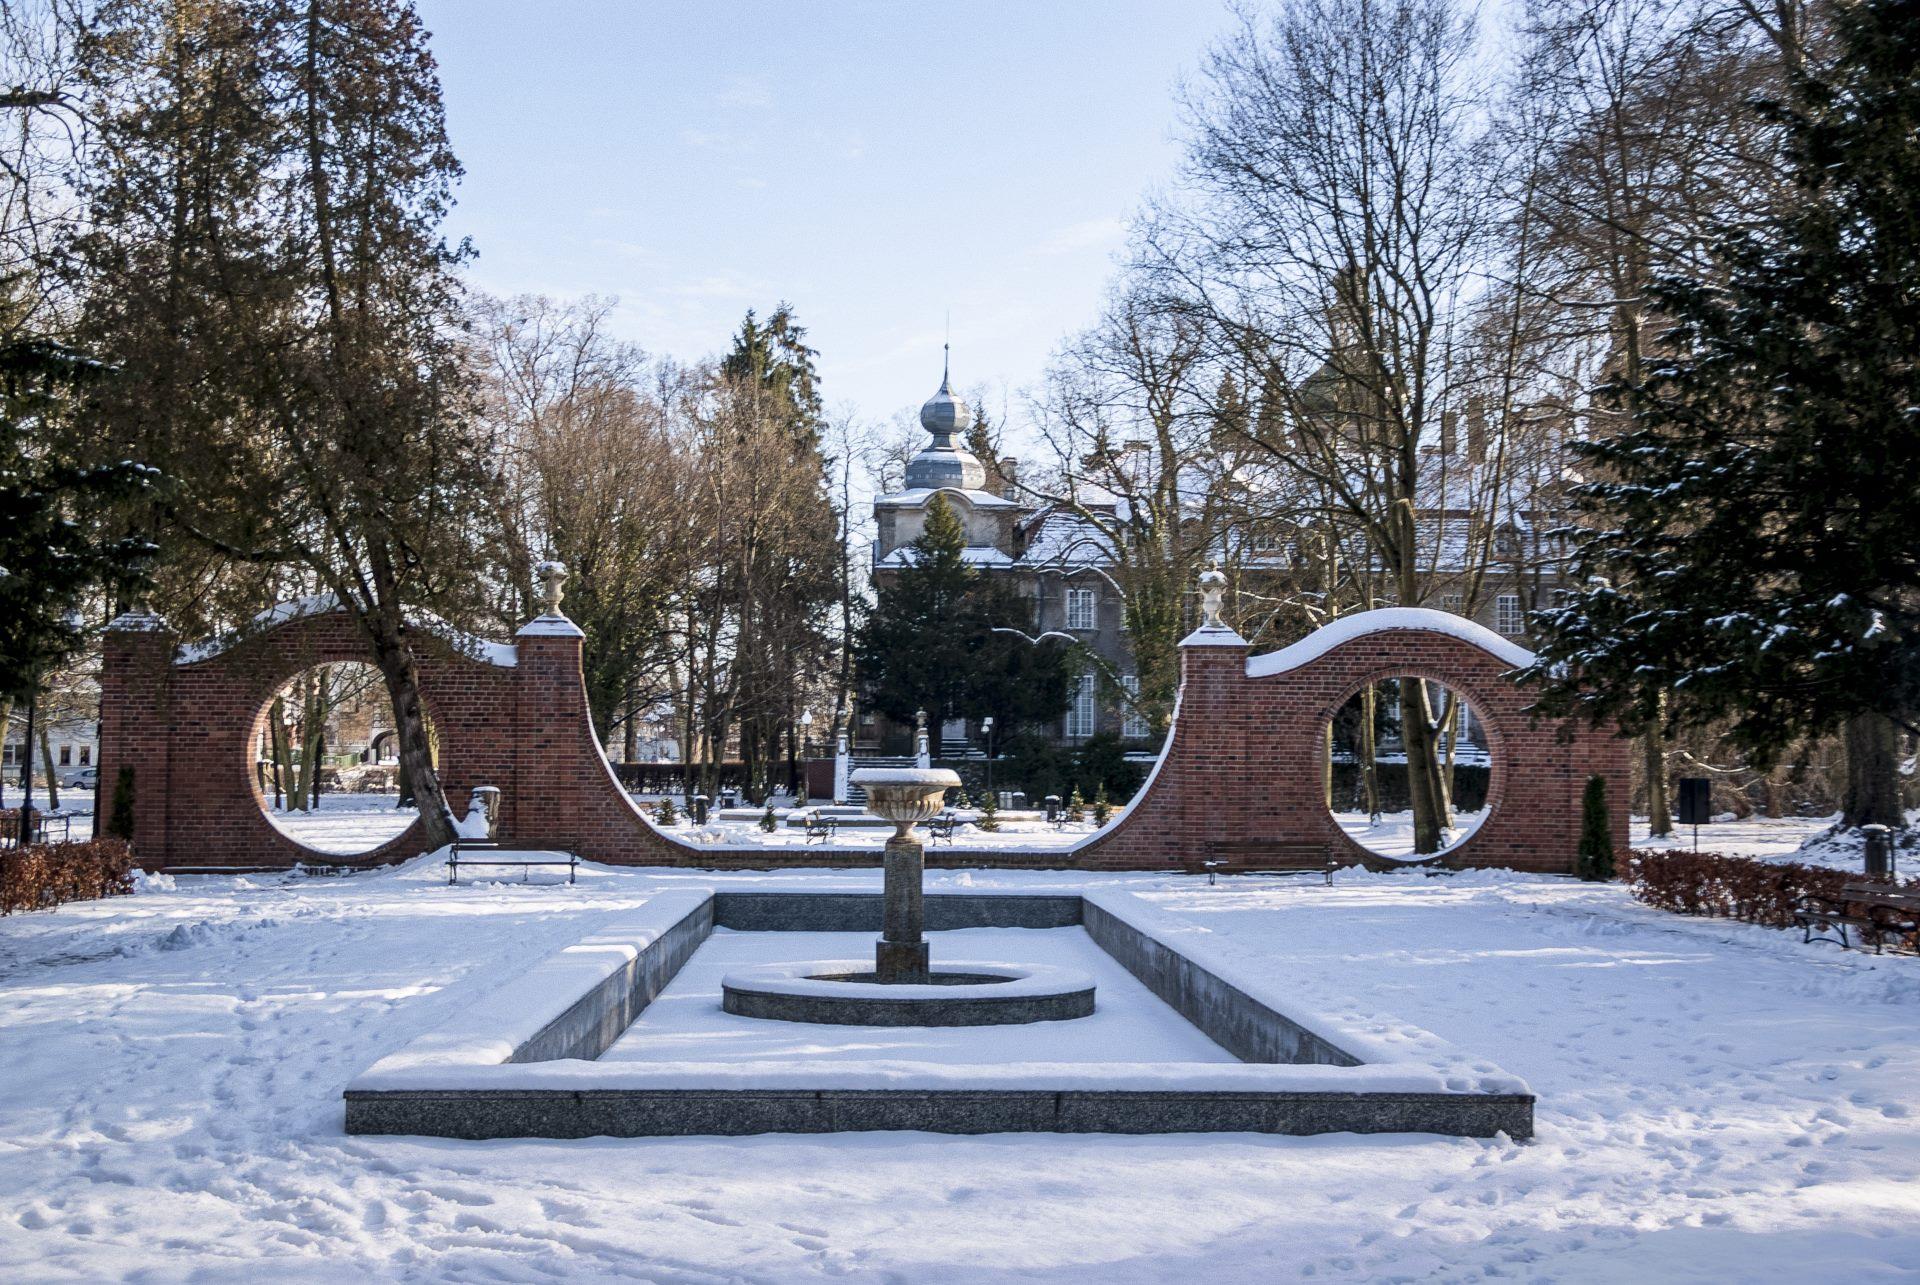 Japanese garden Iłowa - winter